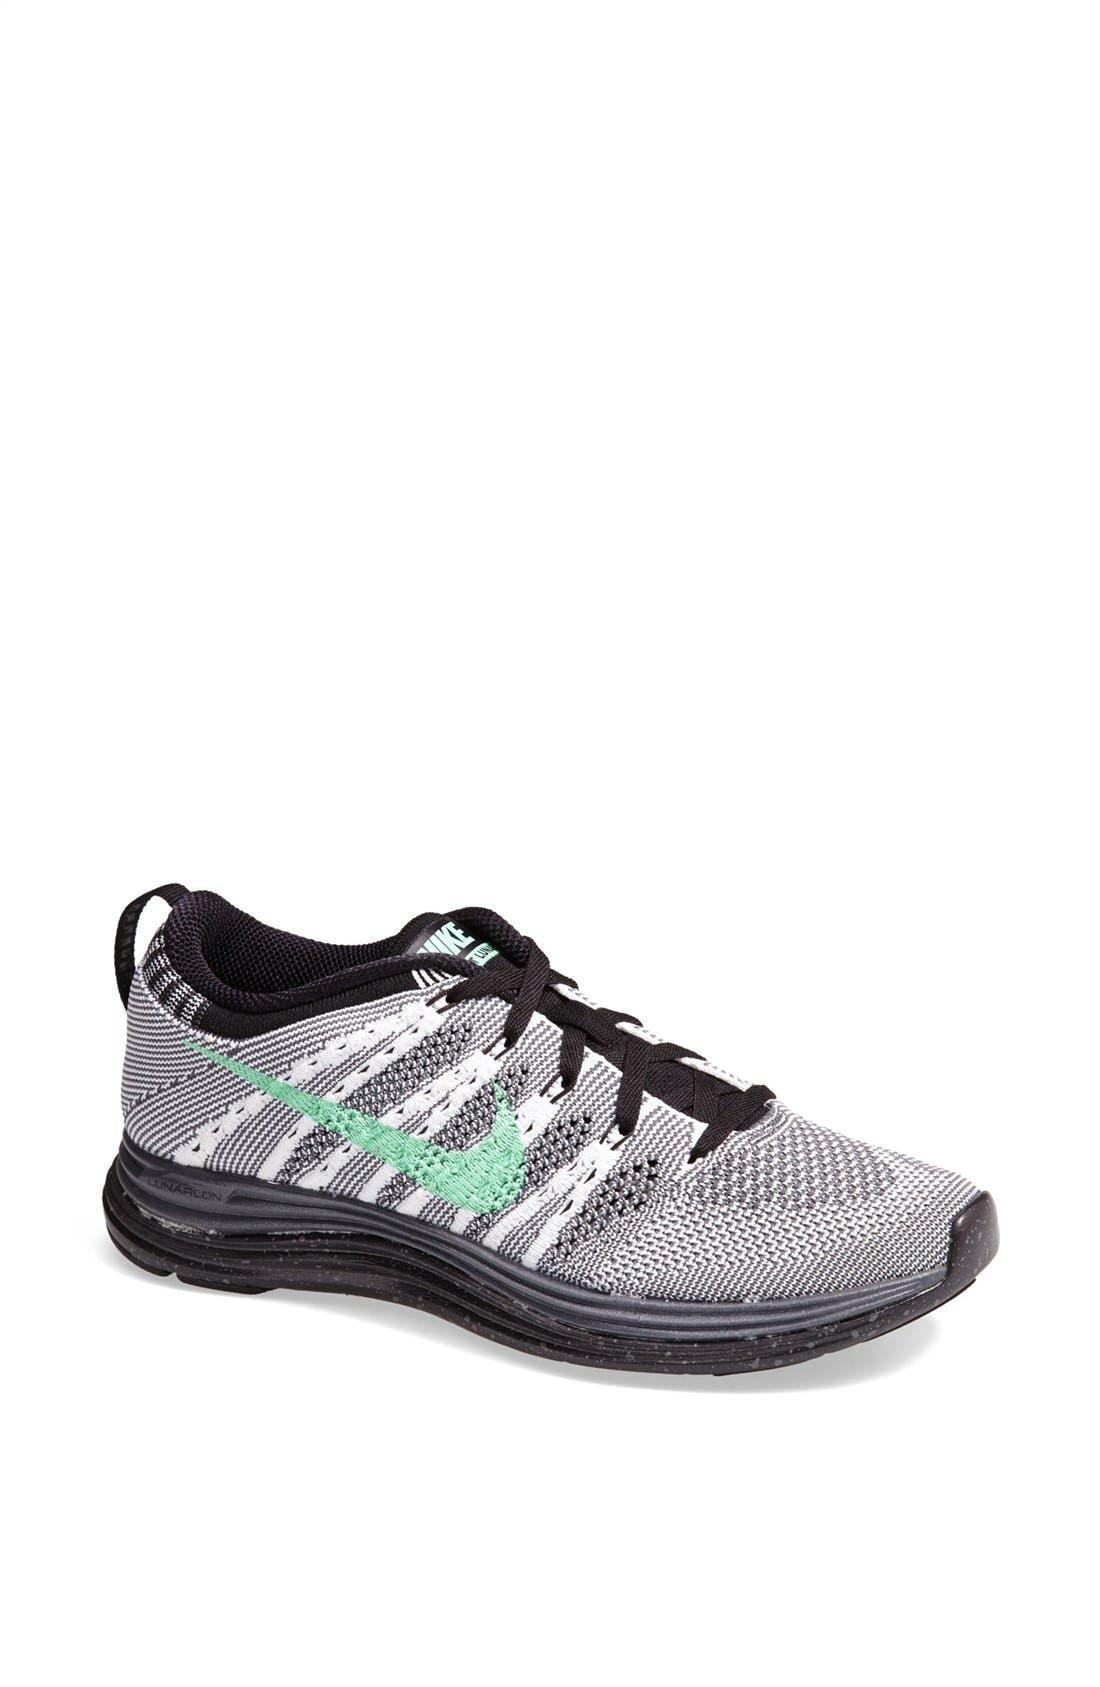 Alternate Image 1 Selected - Nike 'Flyknit Lunar1+' Running Shoe (Women)